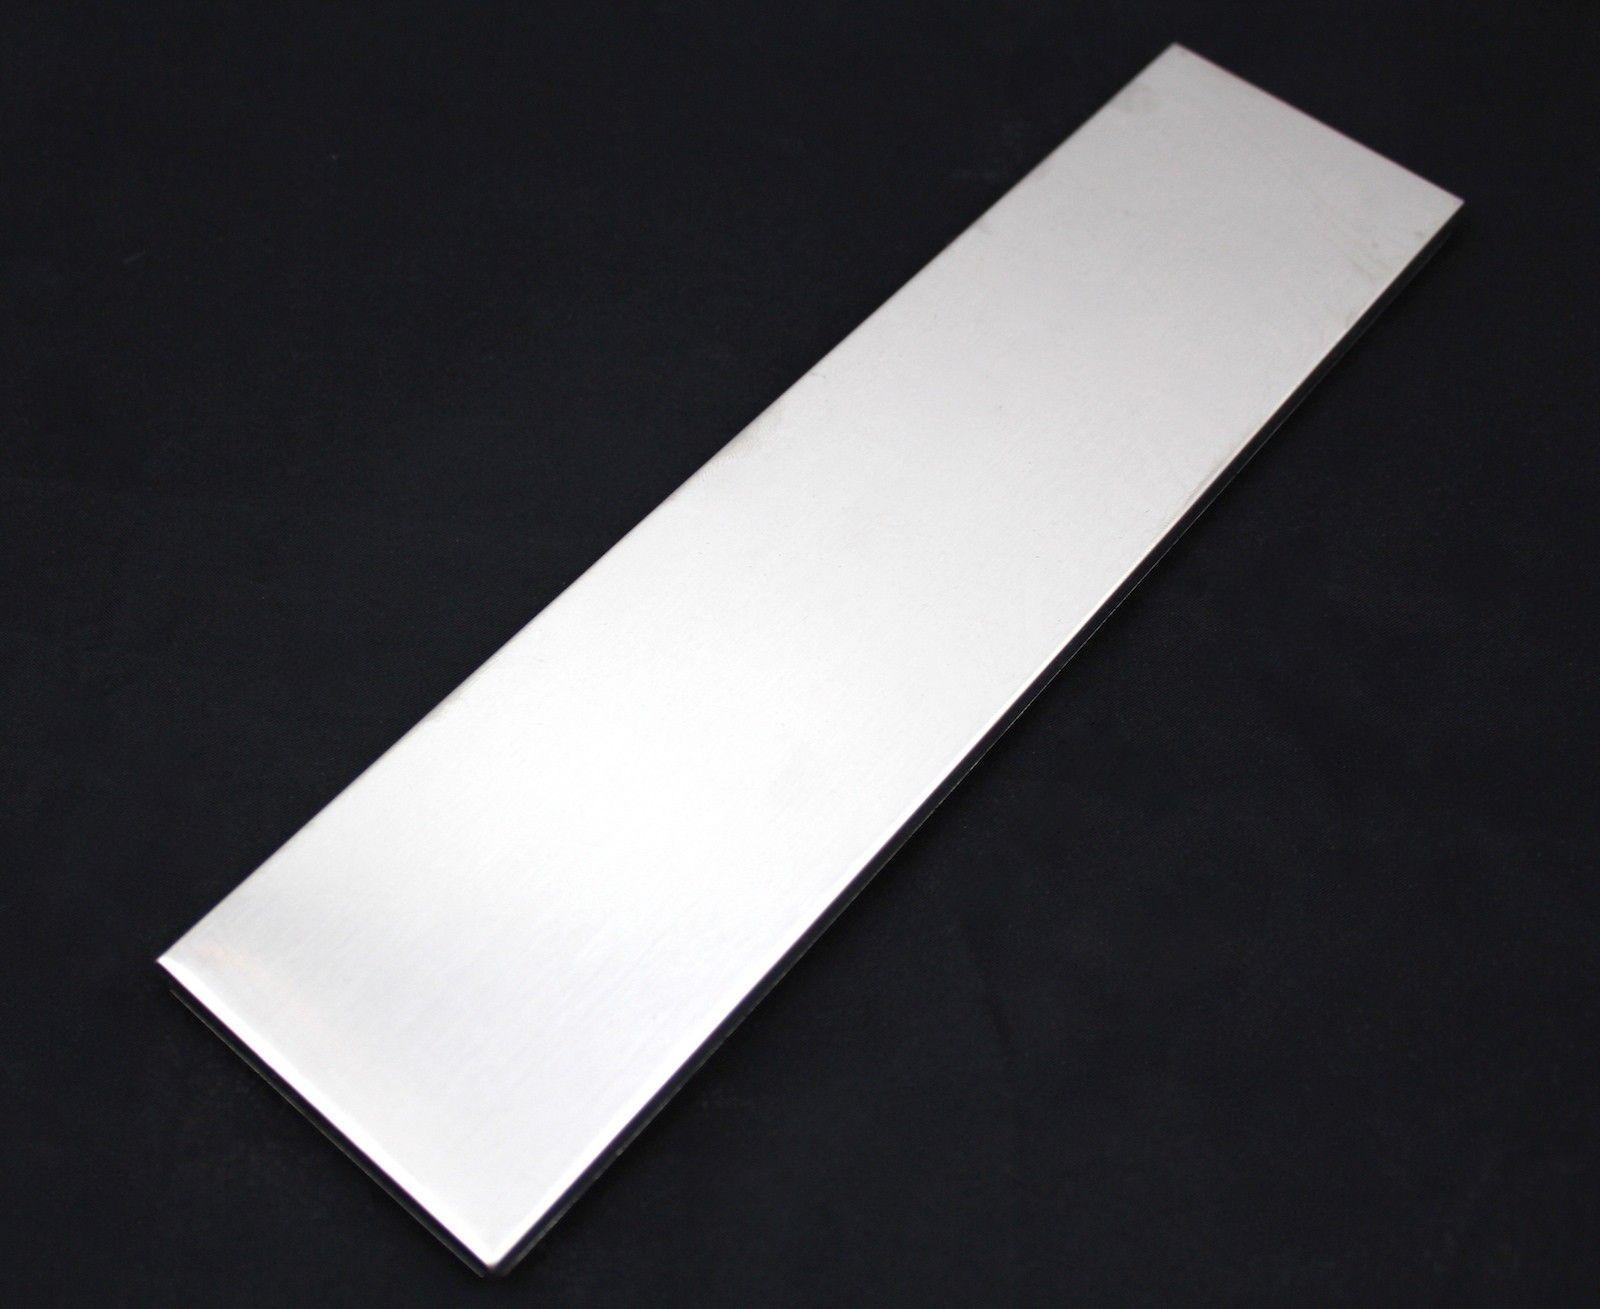 - Stainless Steel Tiles Kitchen Backsplash Mi-lin Acier Inoxydable